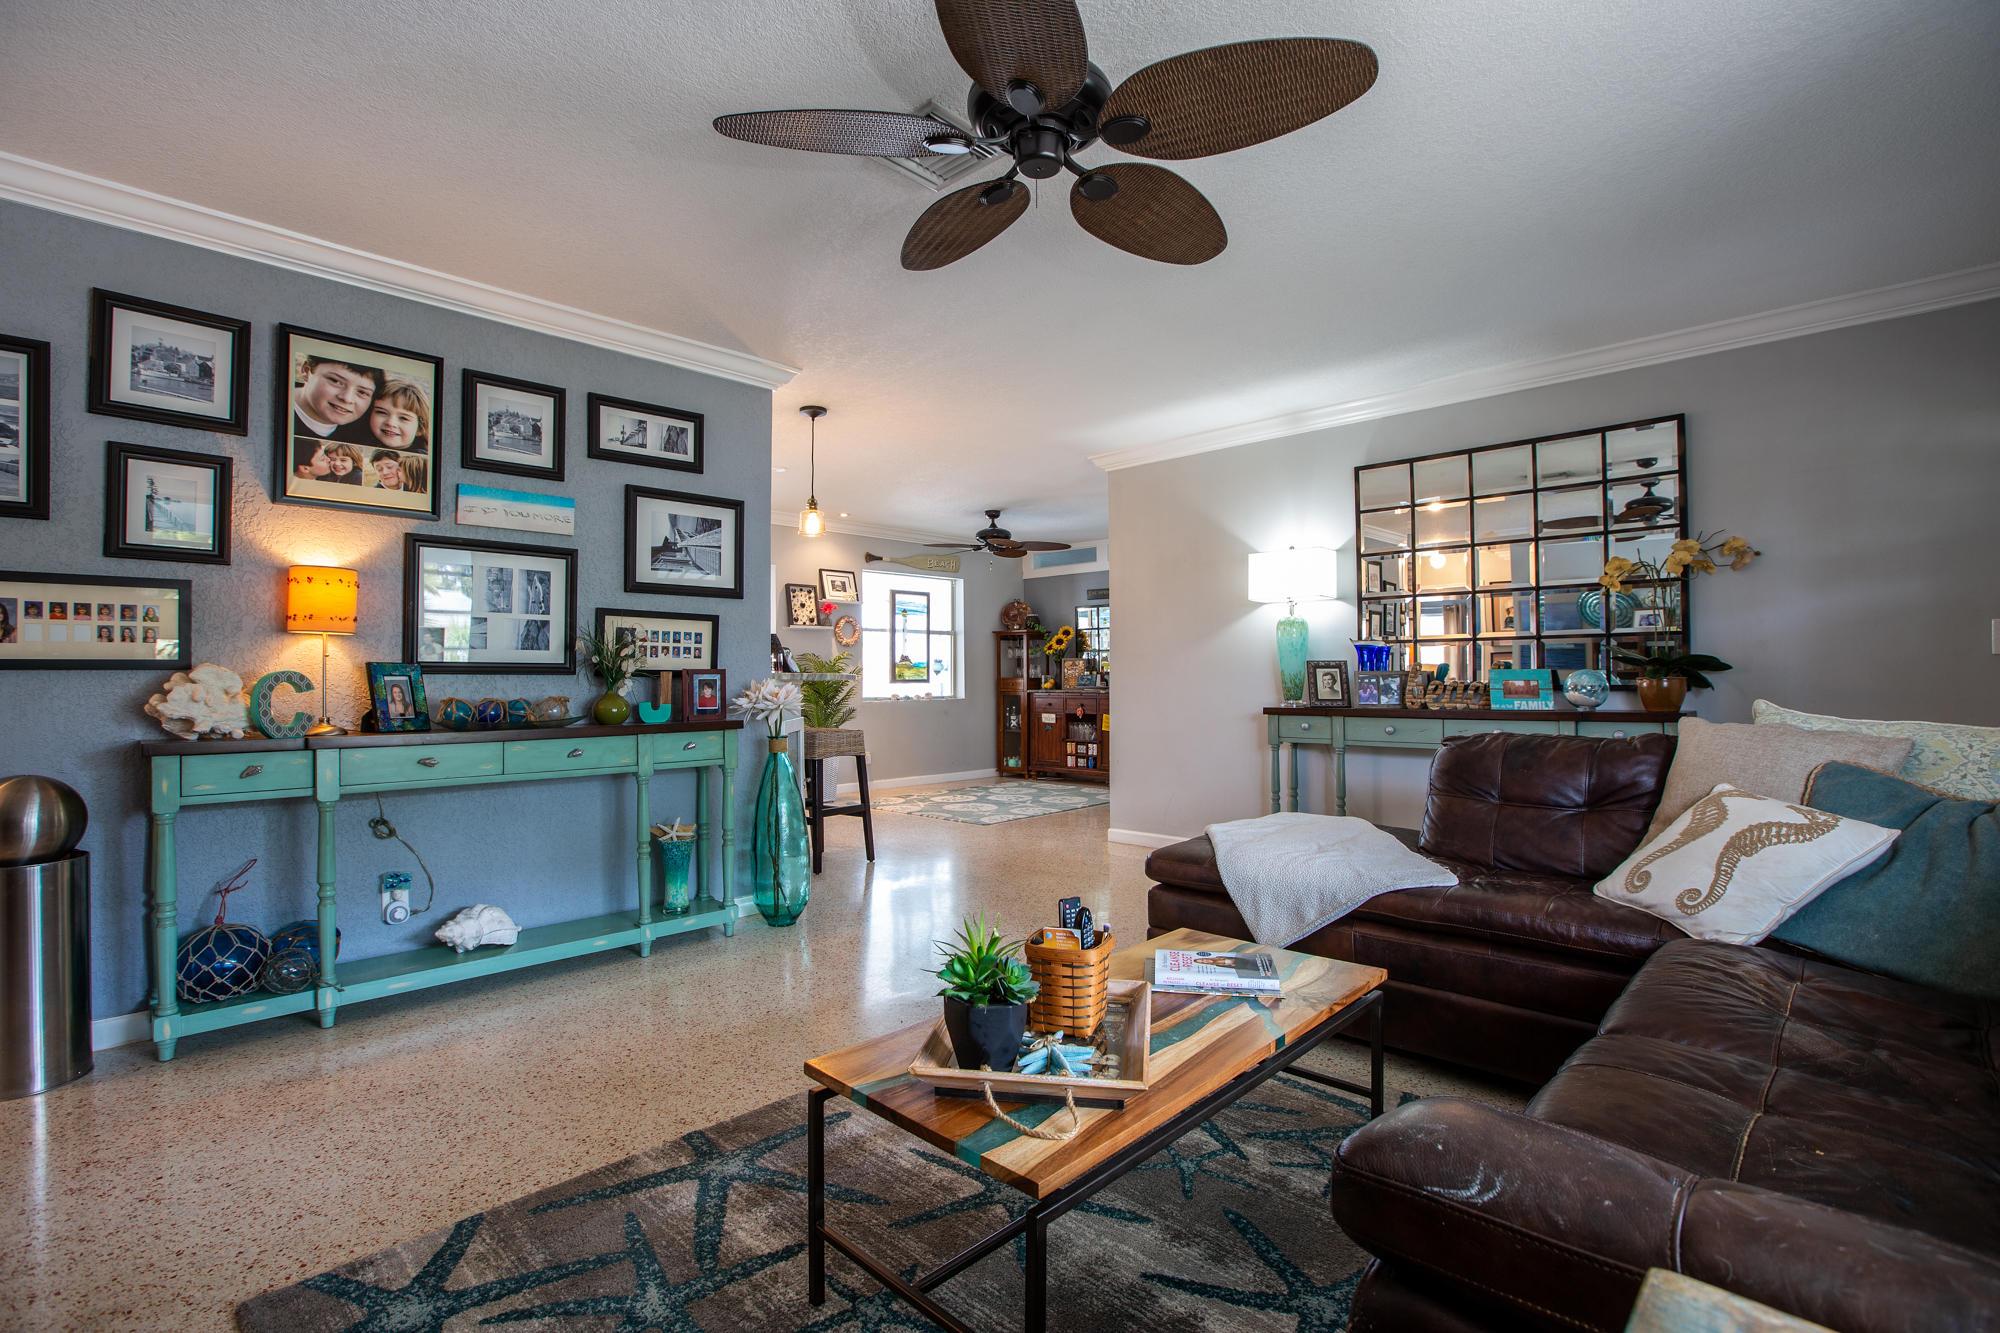 500 Se 4th Street, Deerfield Beach, FL 33441